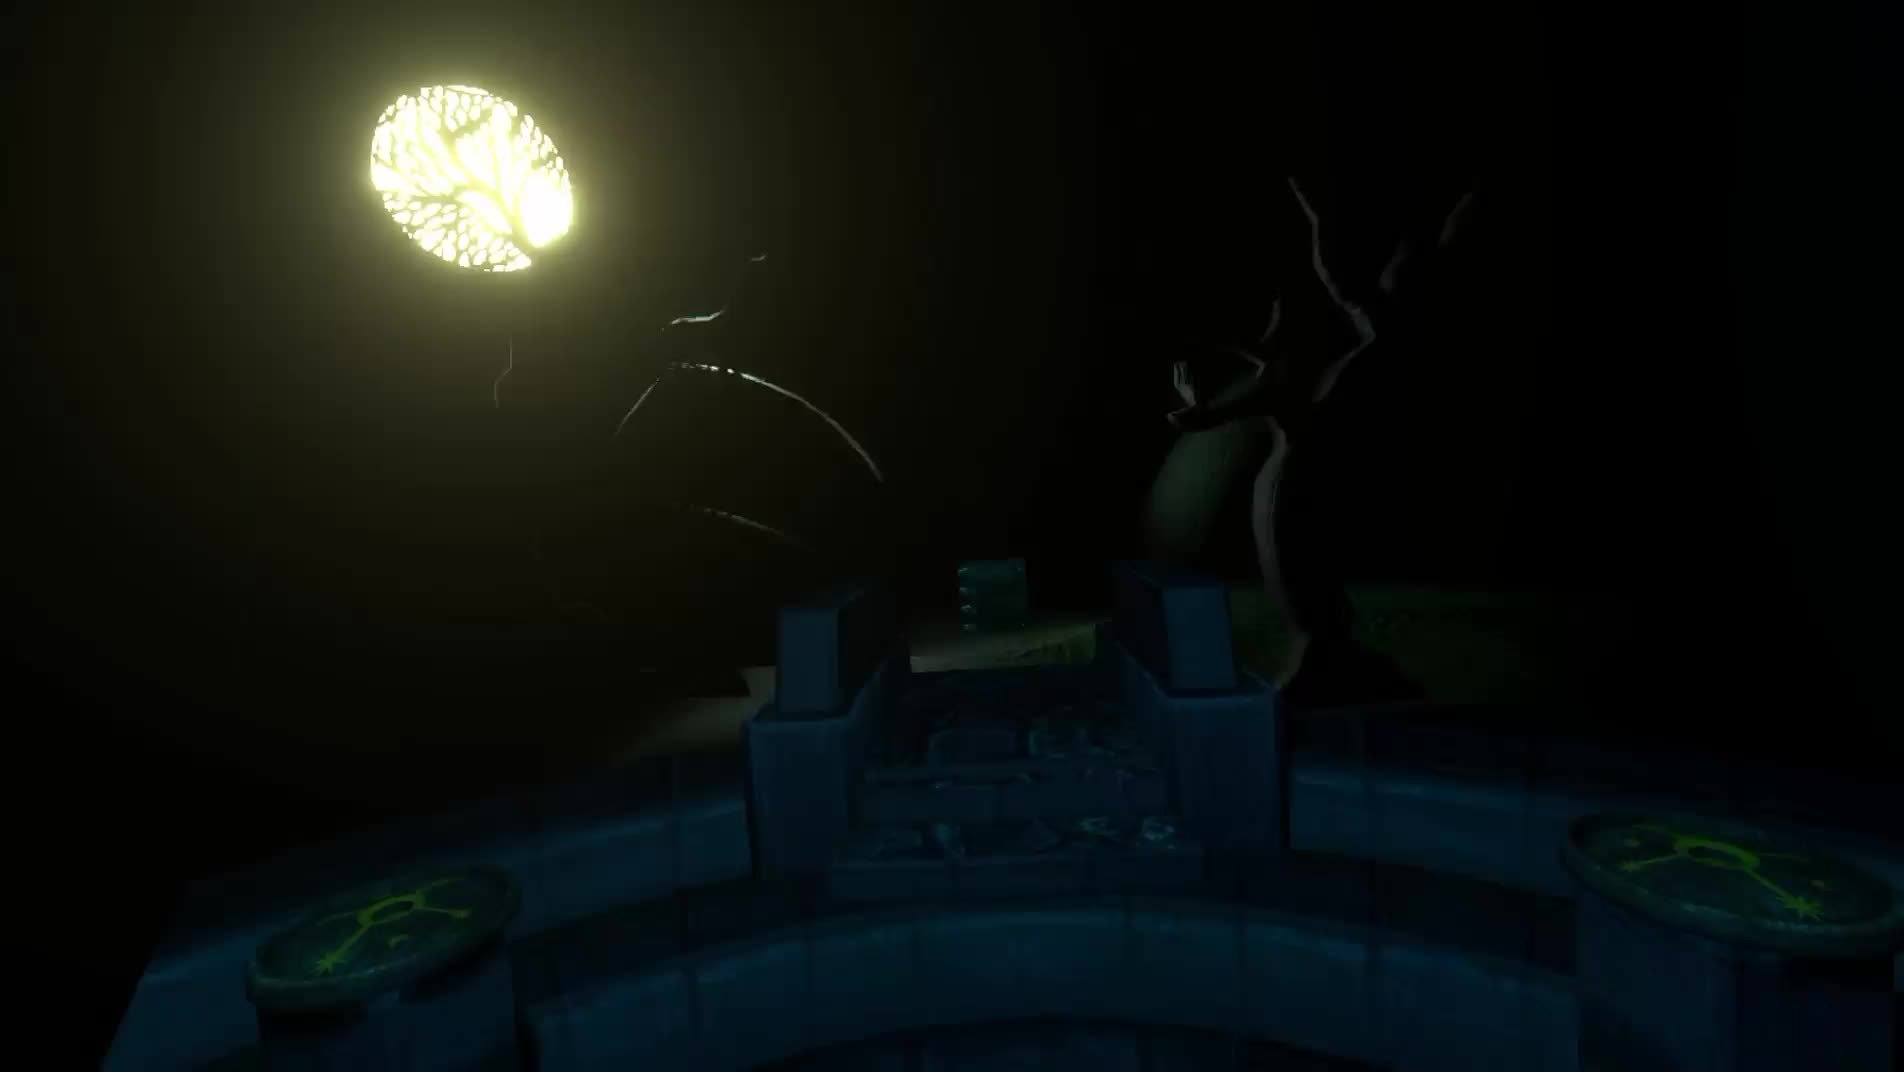 2spooky4me, VR, VirtualReality, Spooky Spell Book in VR GIFs